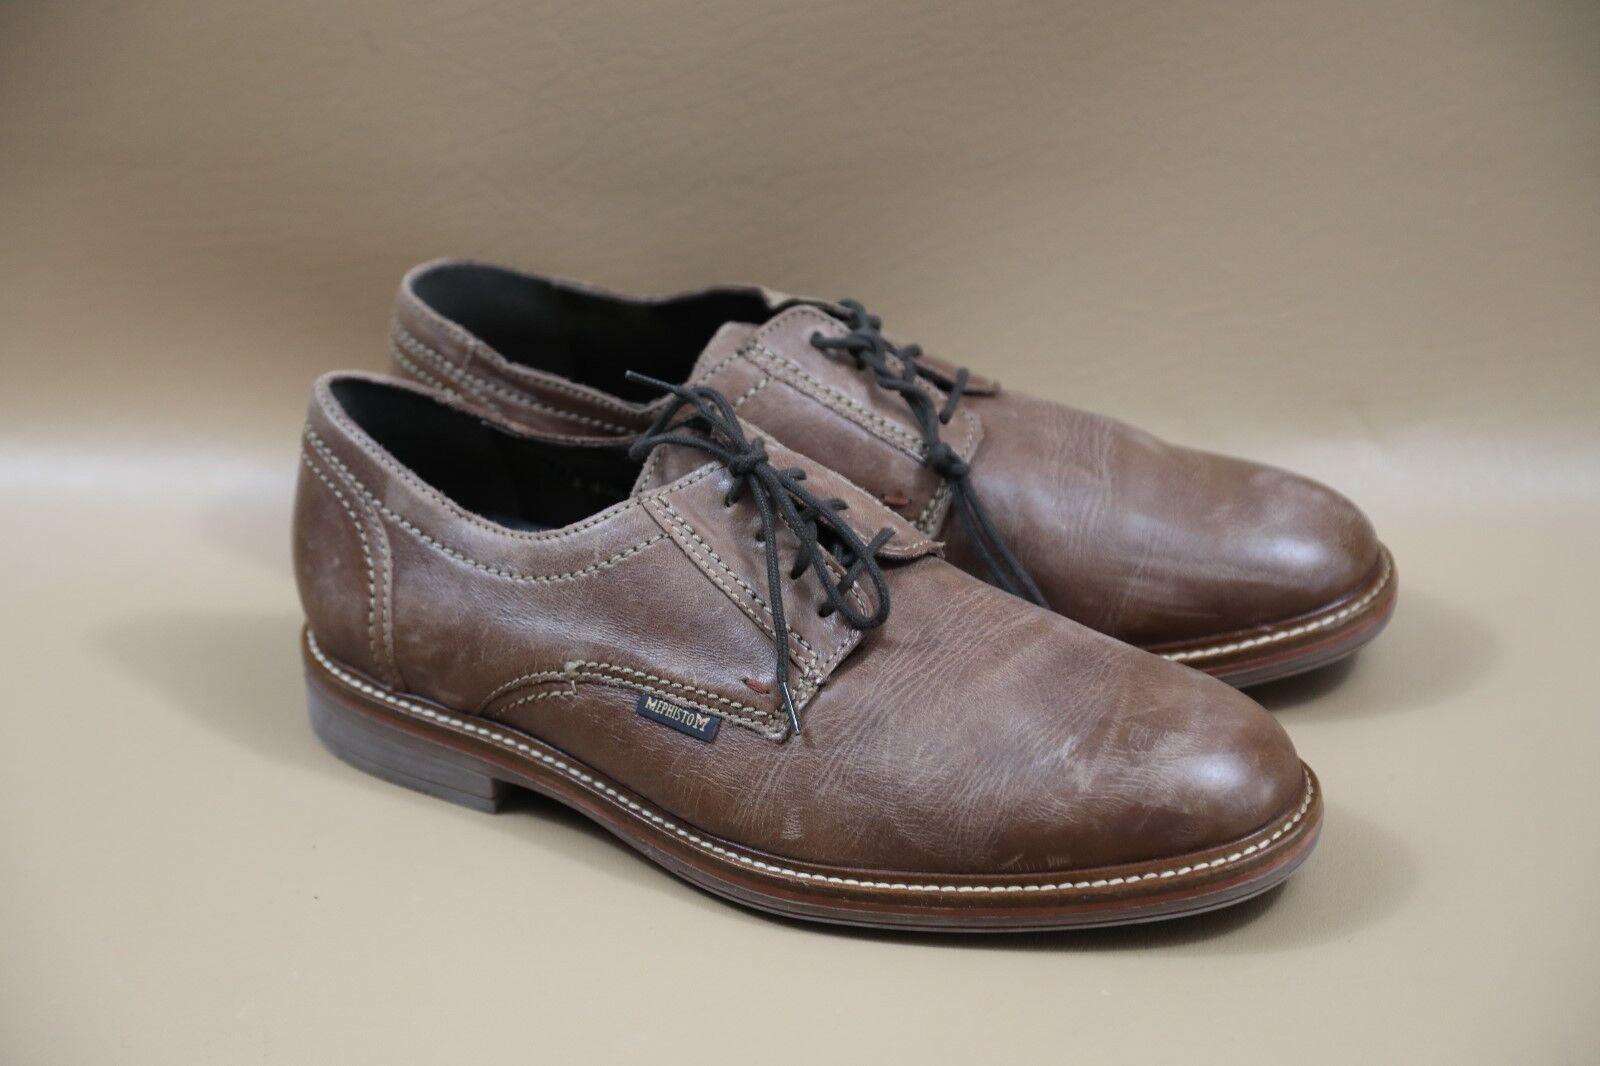 63 MEPHISTO Men's Oxfords Size 10.5